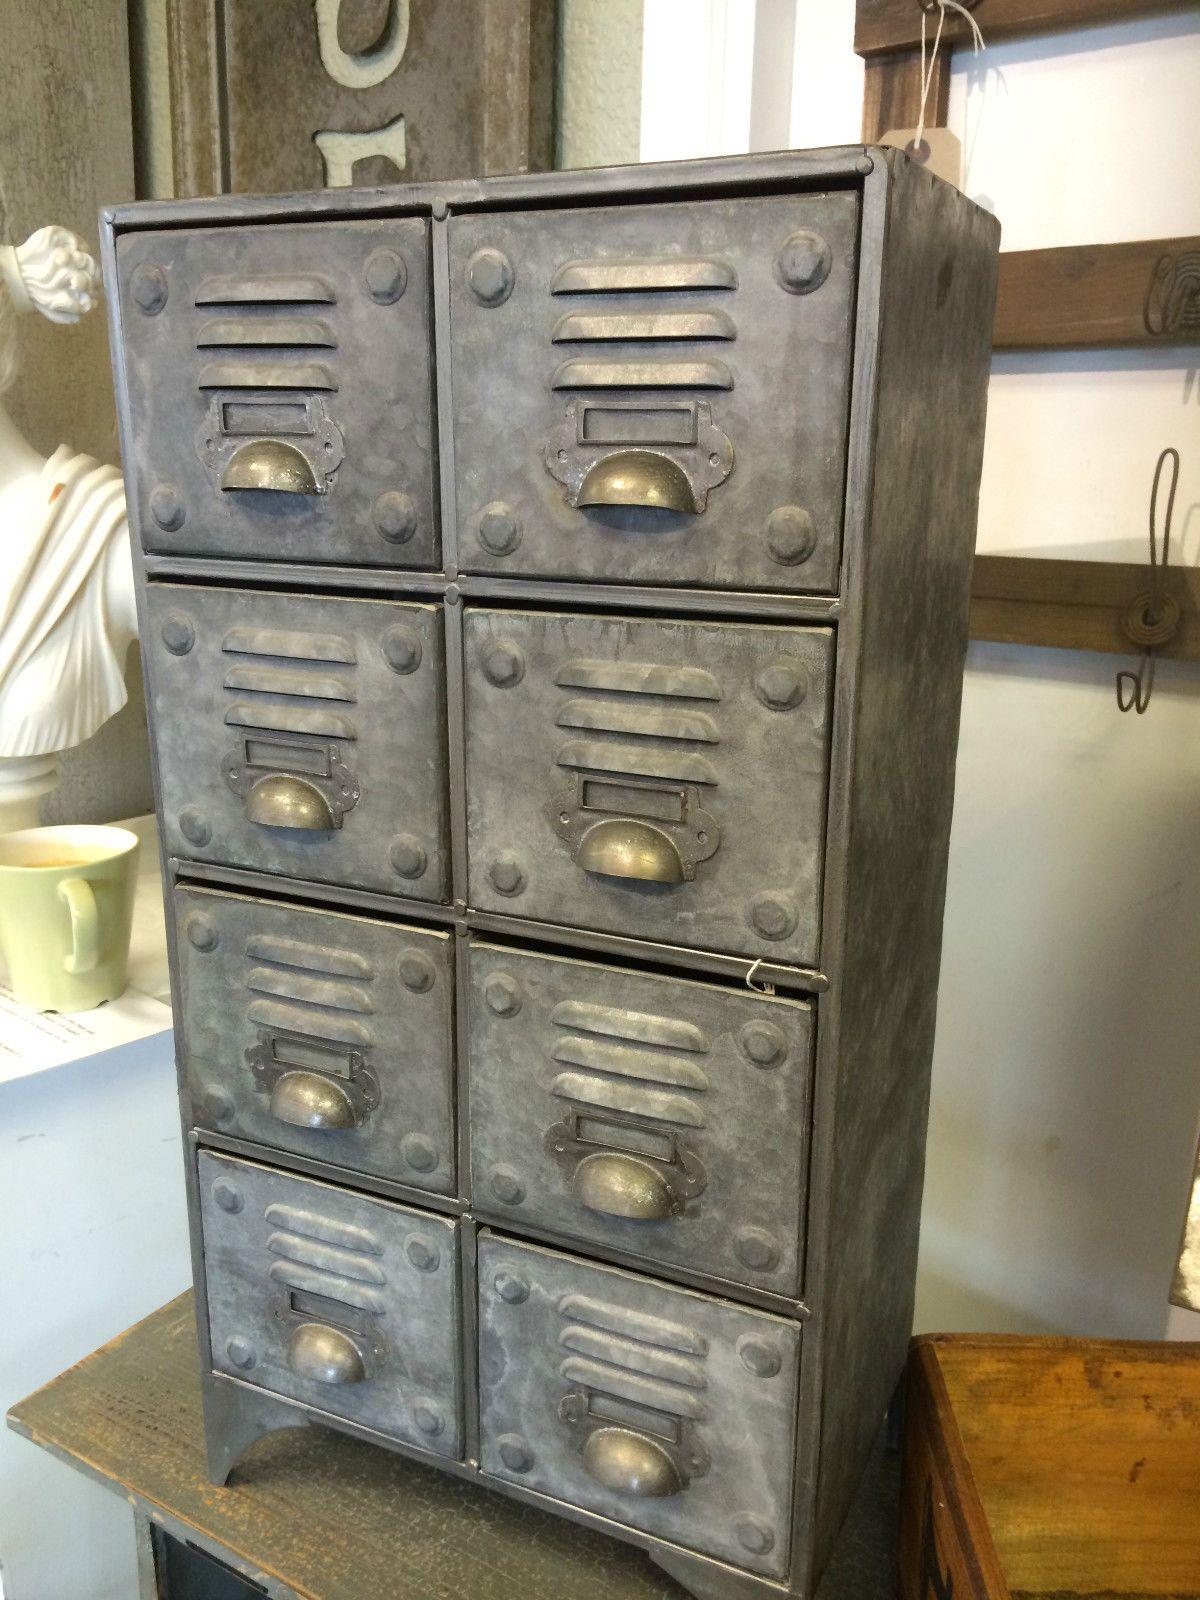 Small Bank Of 8 Draws Vintage Drawer Metal Storage Cabinet Cupboard